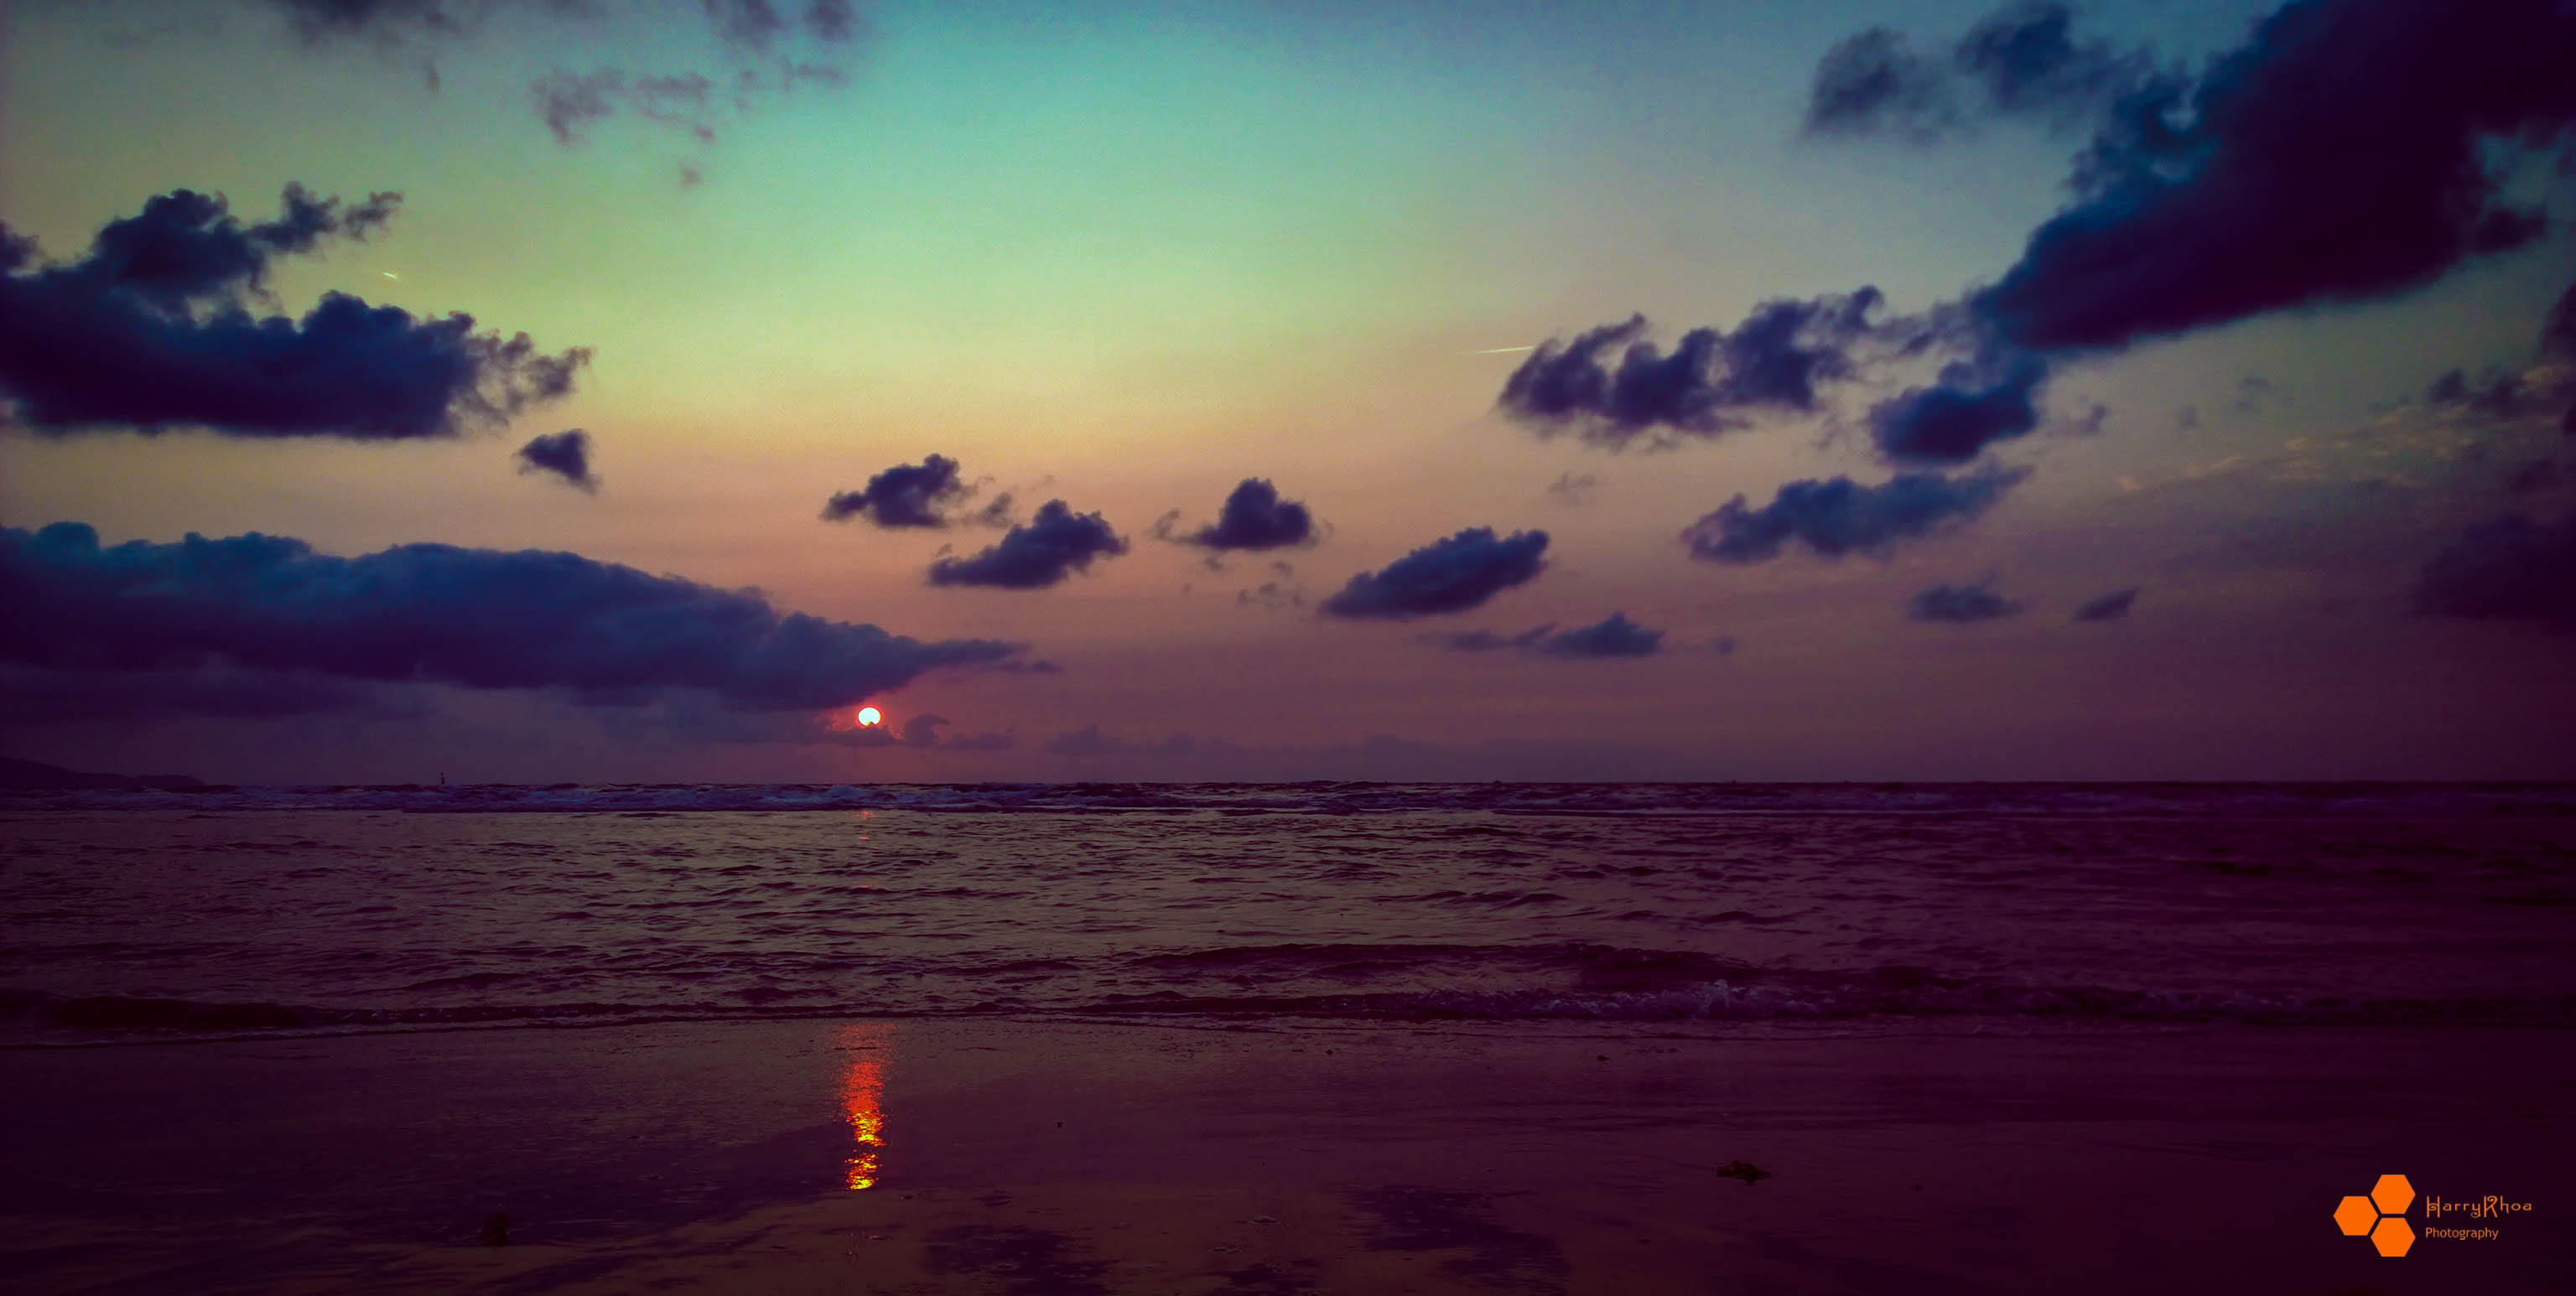 sunset-3_16687234697_o.jpg